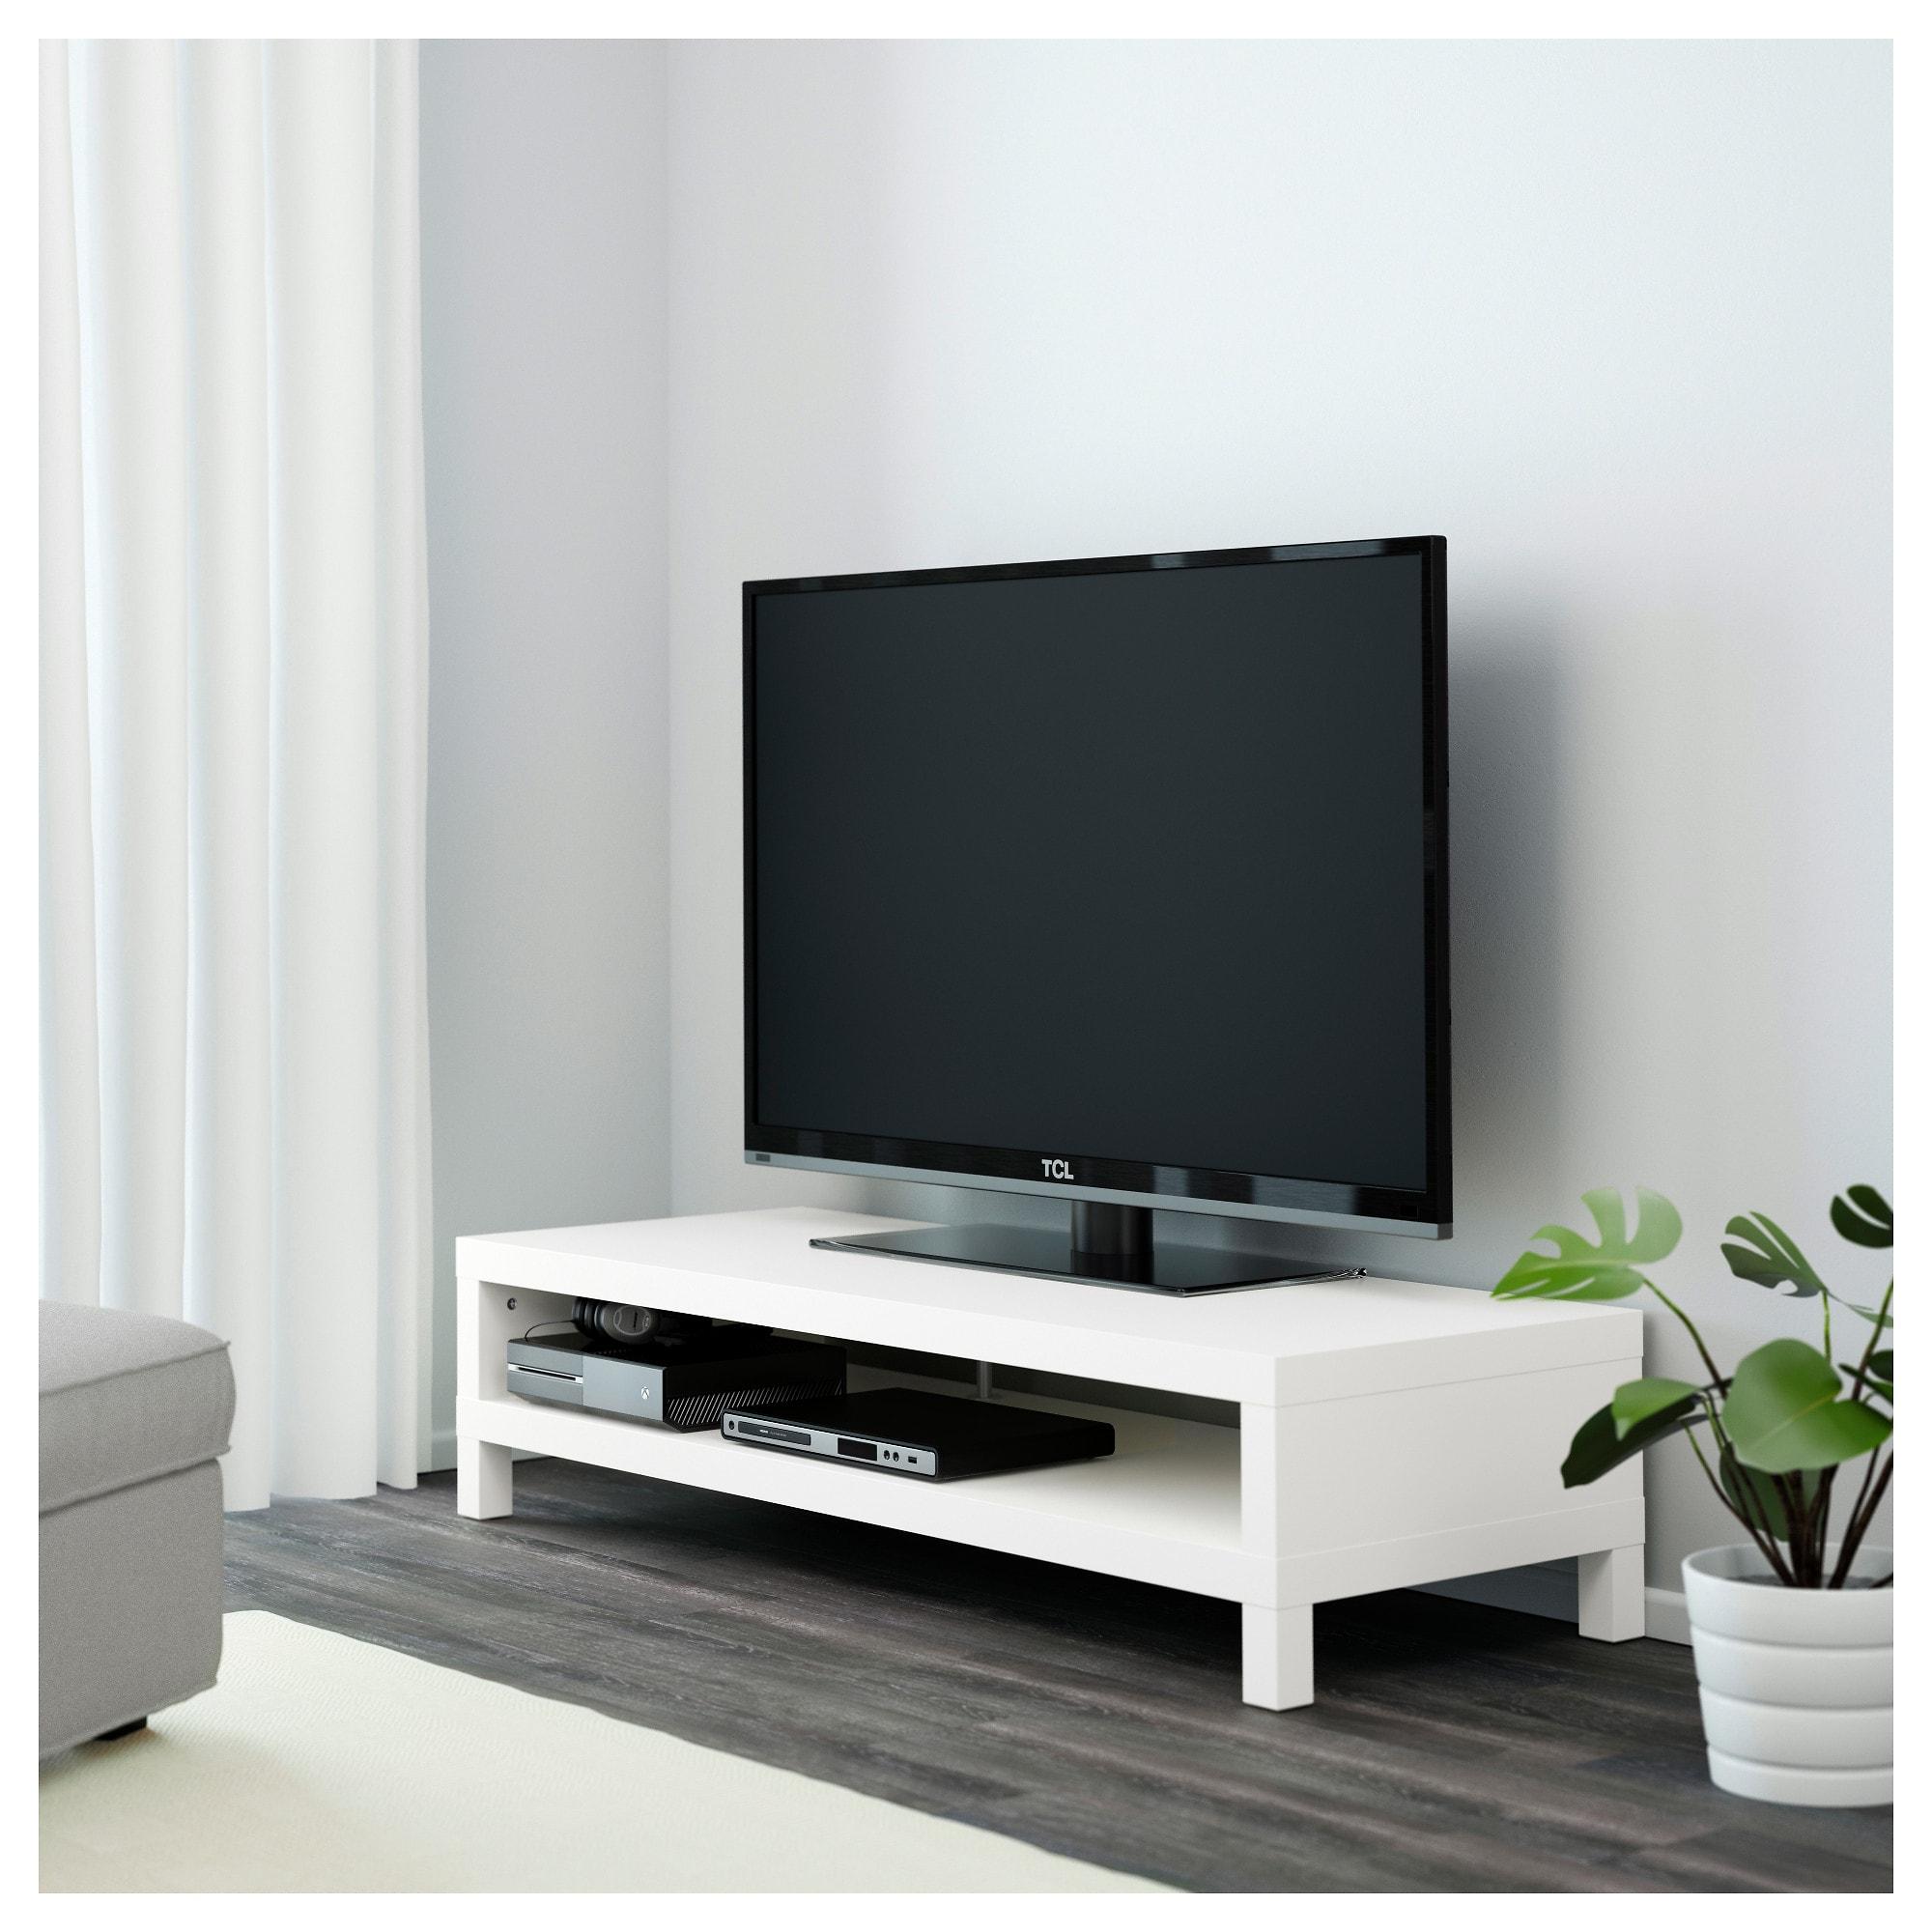 Benno Tv Meubel Ikea.Ikea Tv Bank Weiss Ikea Bank Weiss 2020 01 10